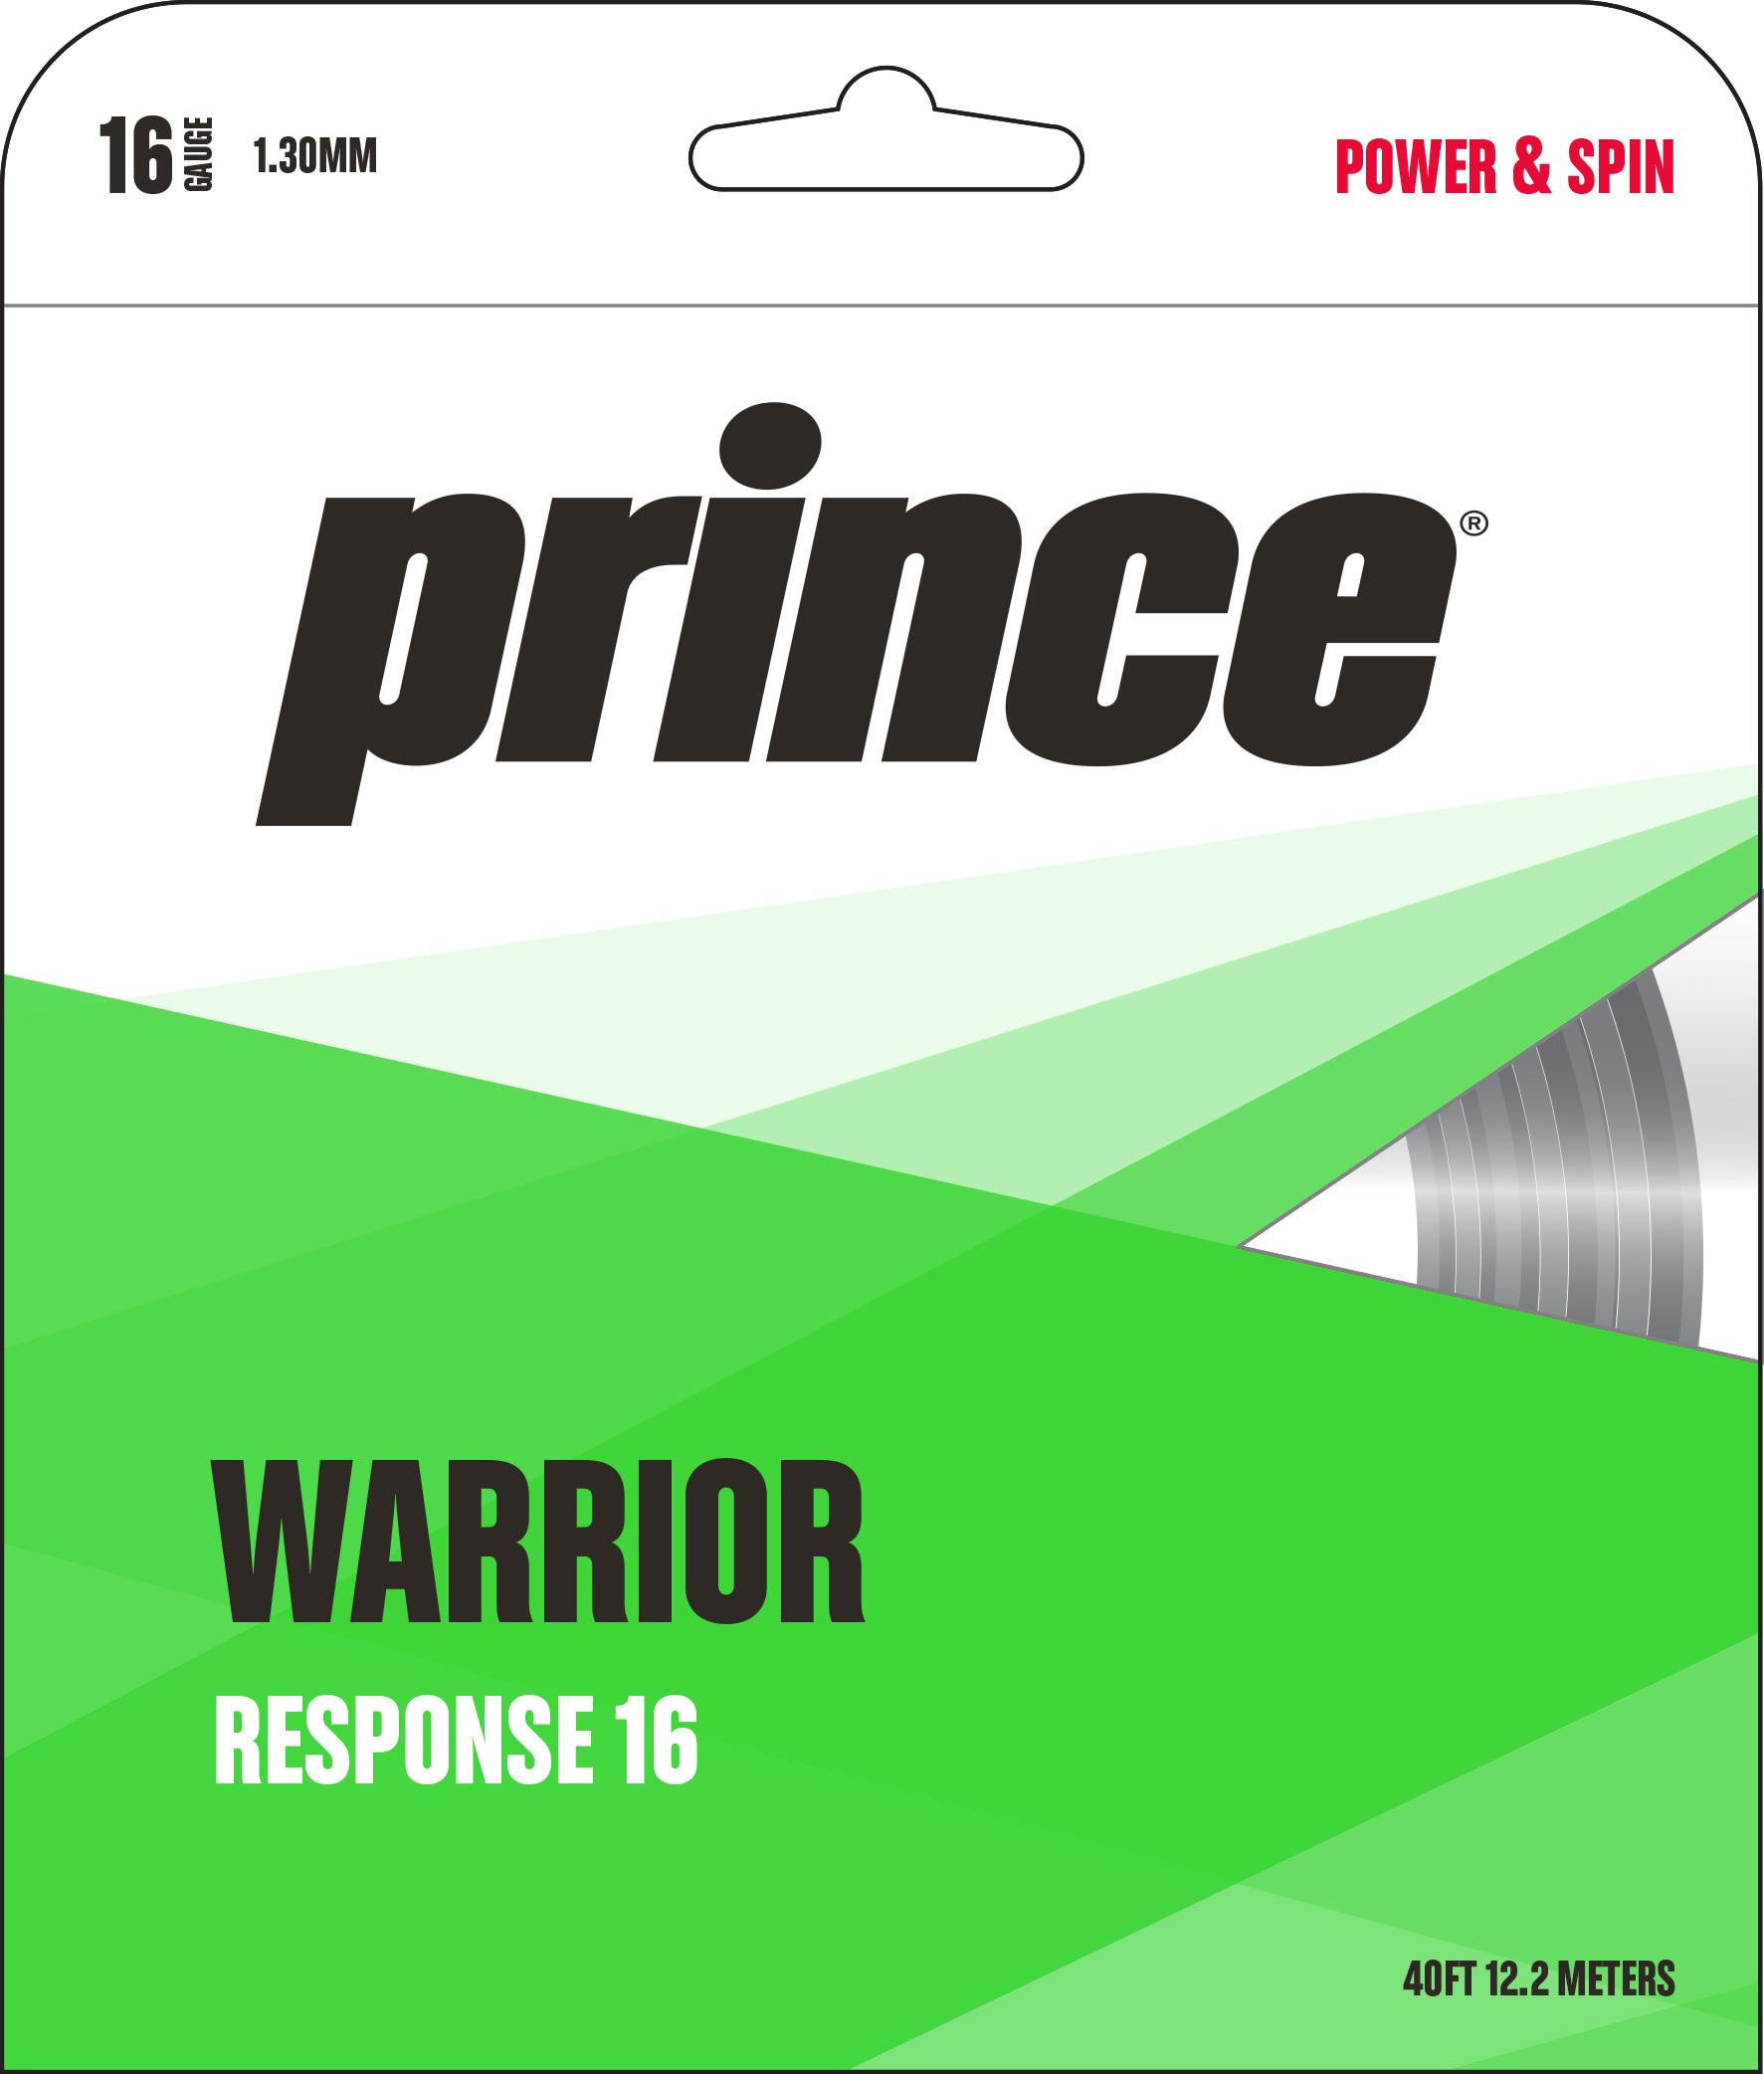 STRING_WARRIOR RESPONSE 16.jpg